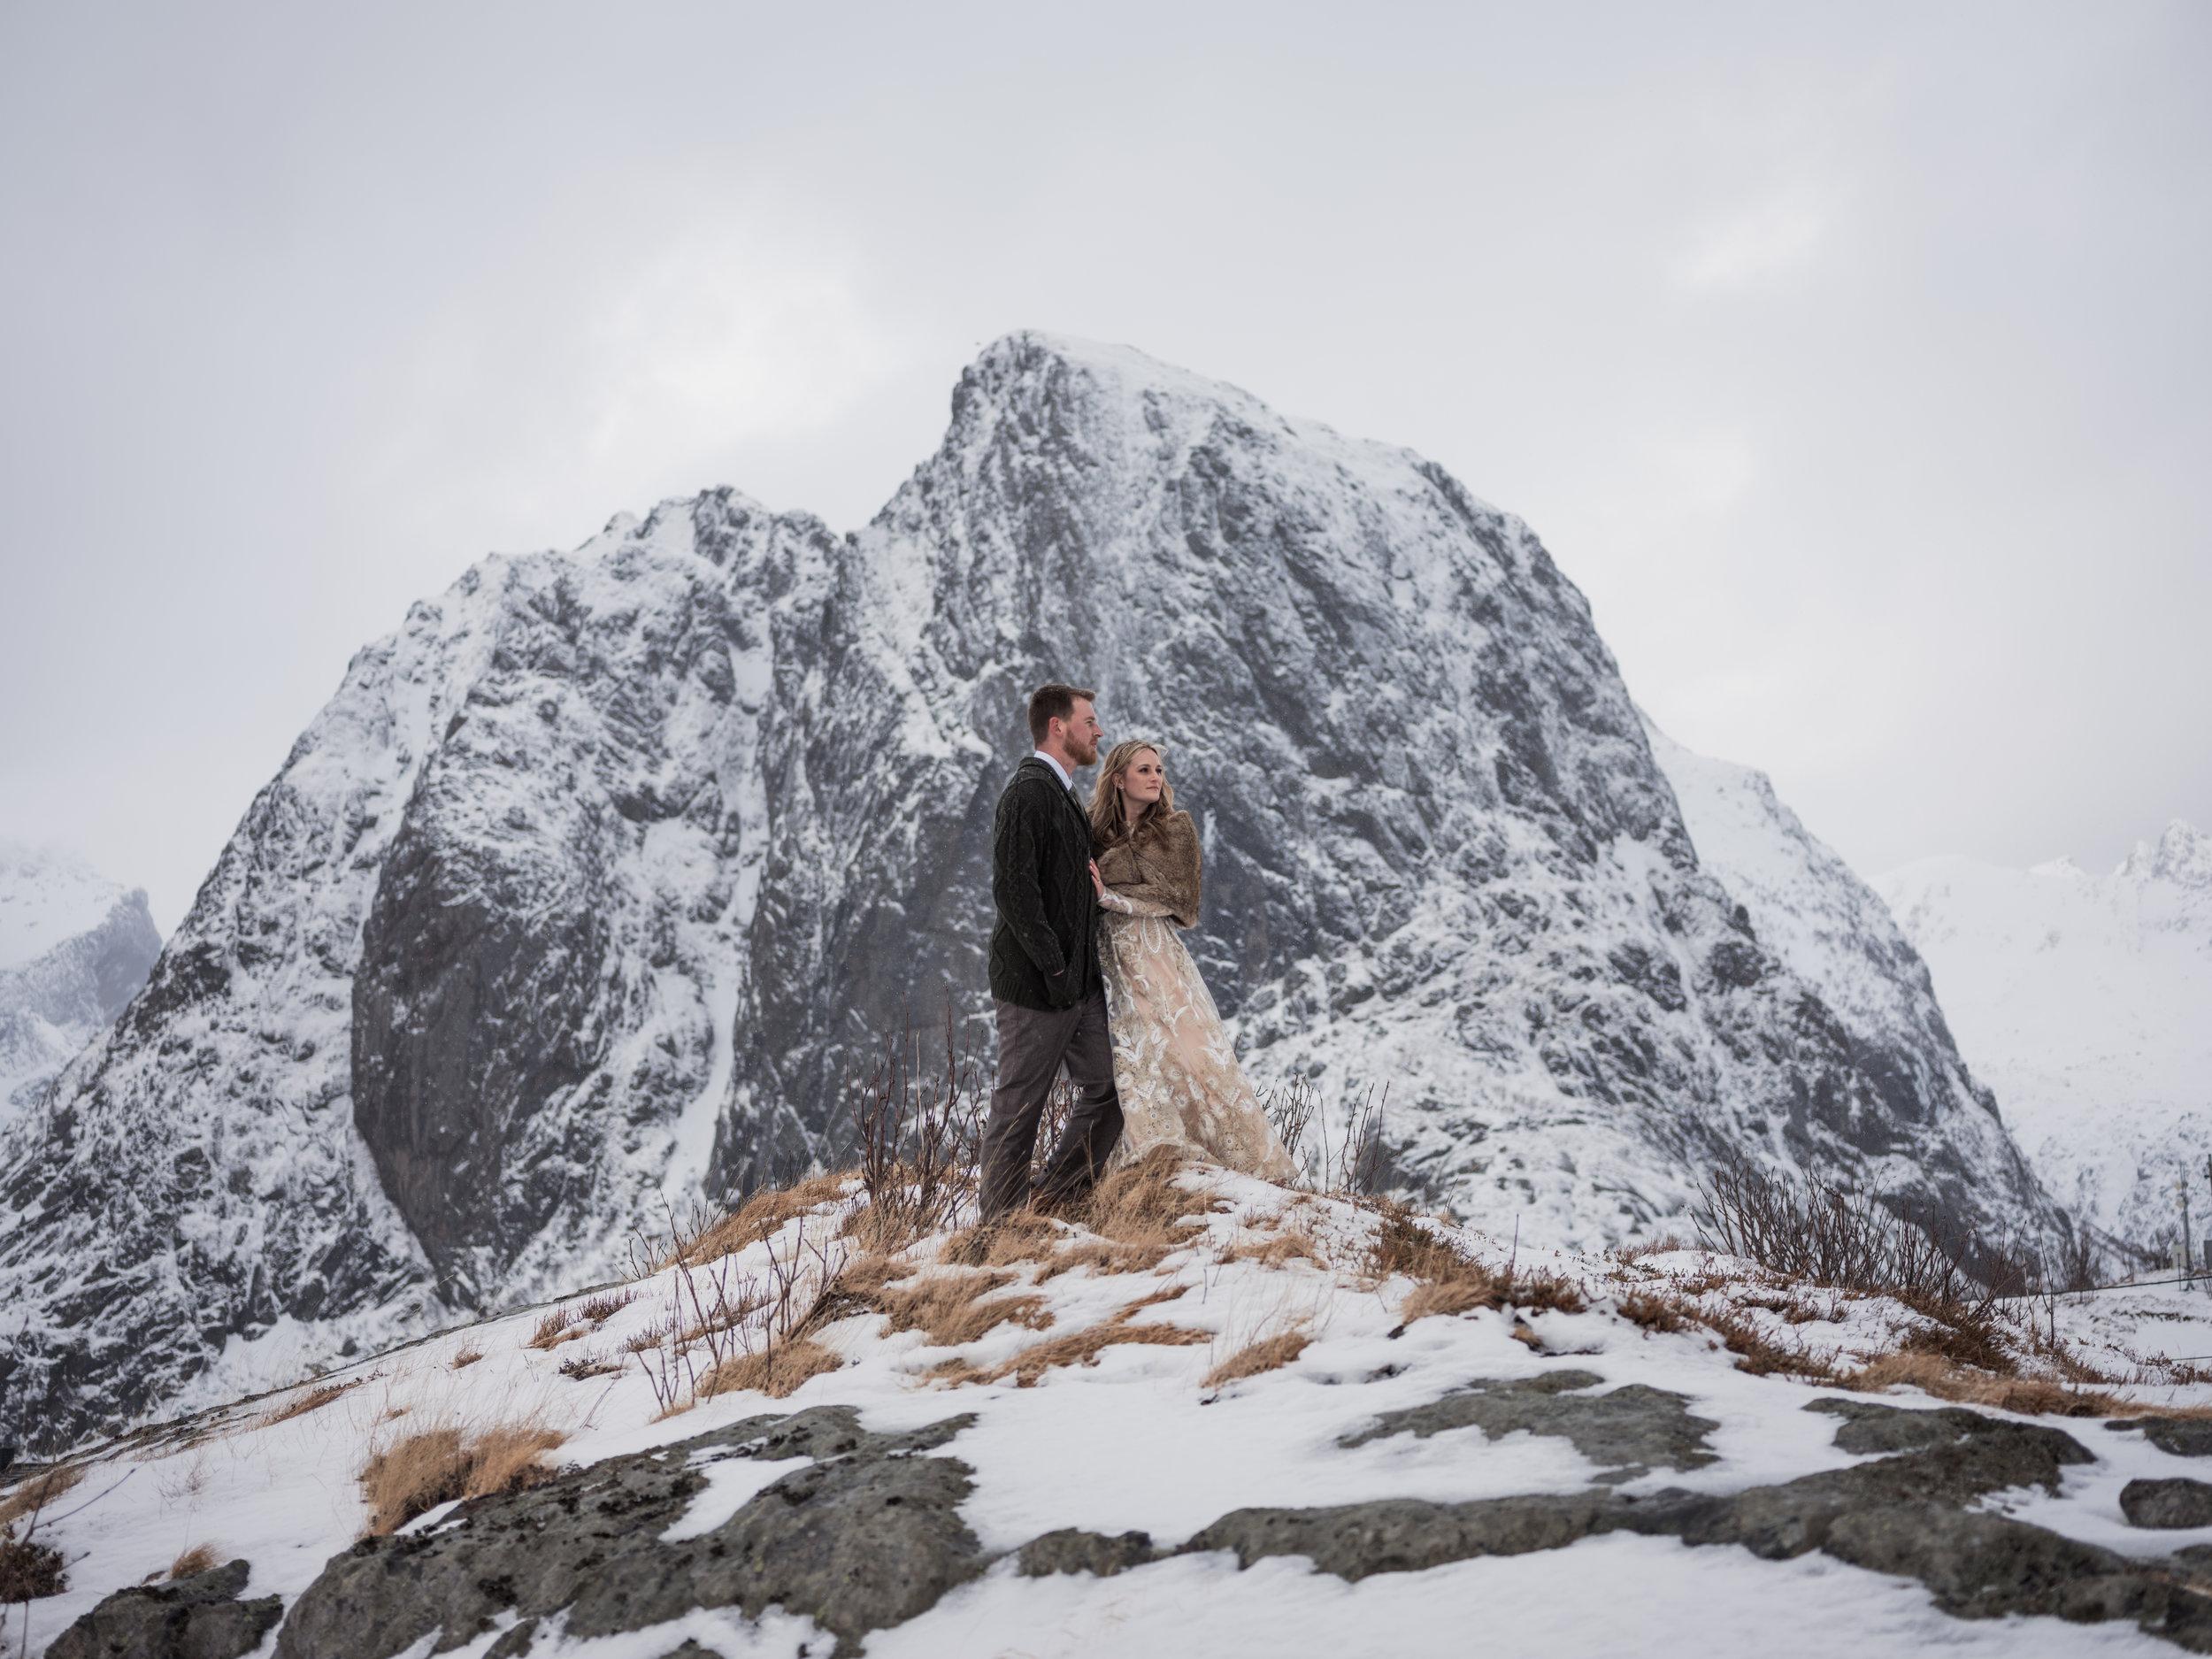 Getting married in Scandinavia